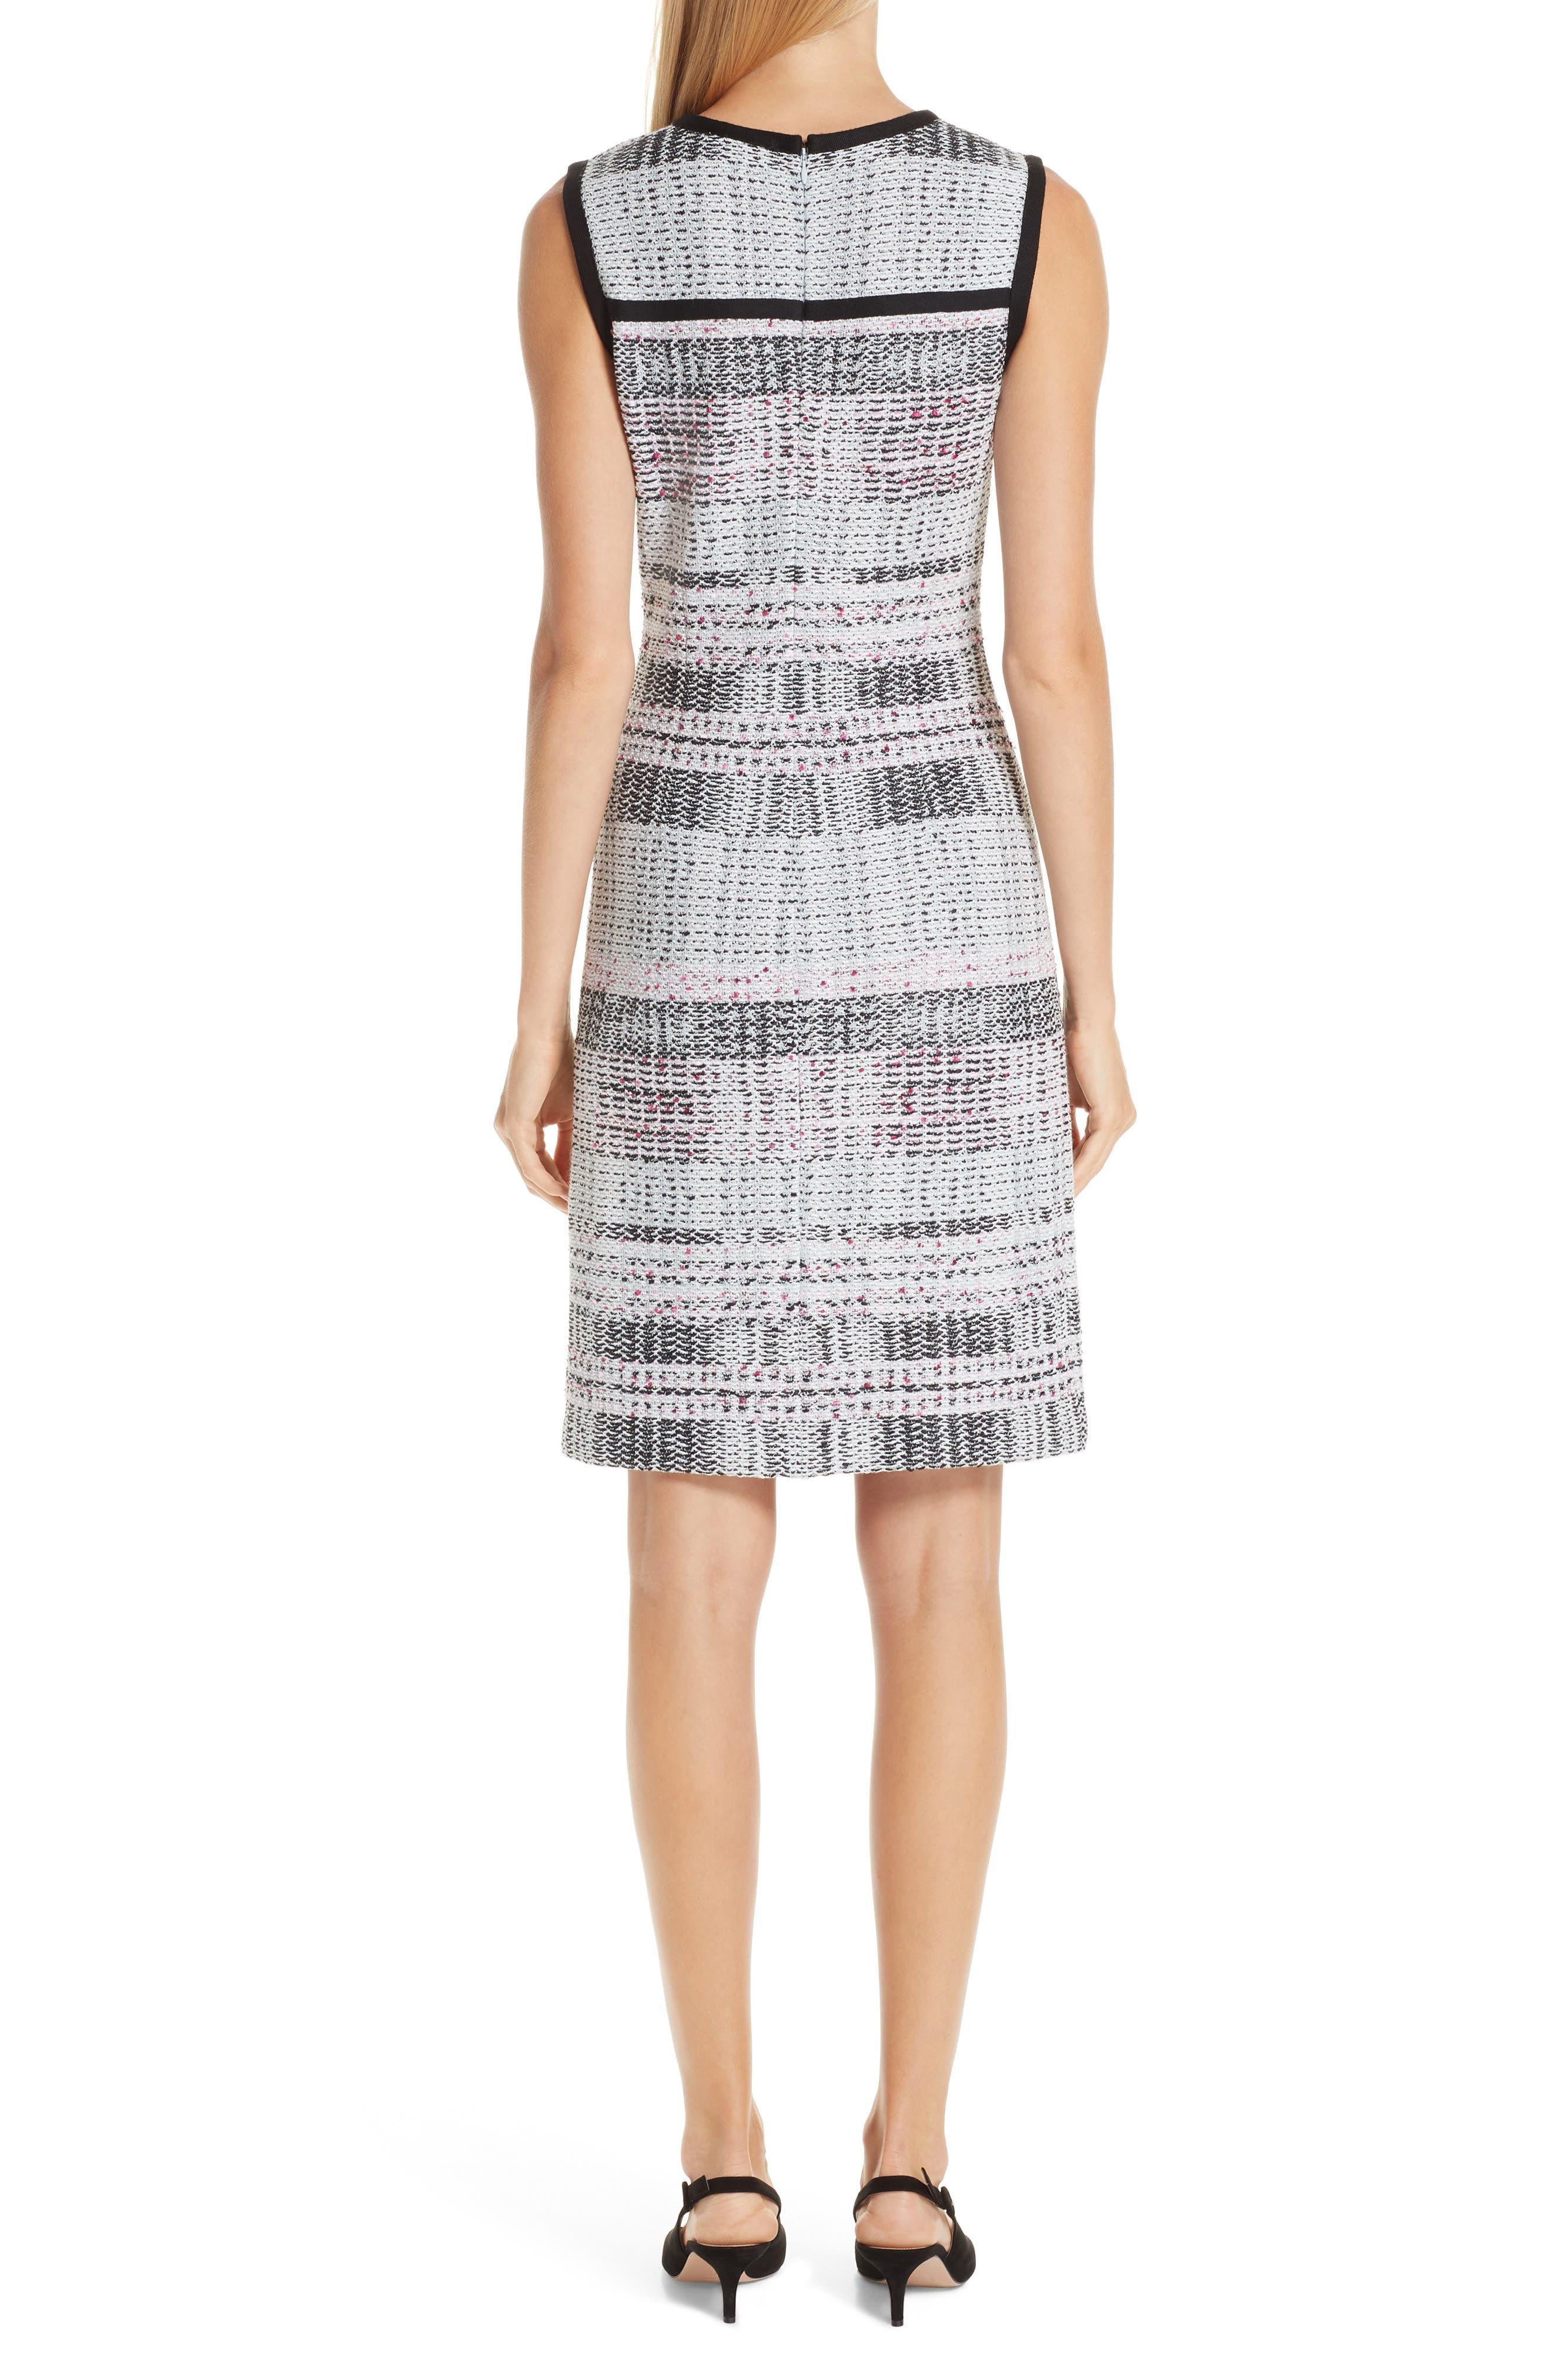 ST. JOHN COLLECTION, Bianca Plaid Knit Sheath Dress, Alternate thumbnail 2, color, GREY MULTI